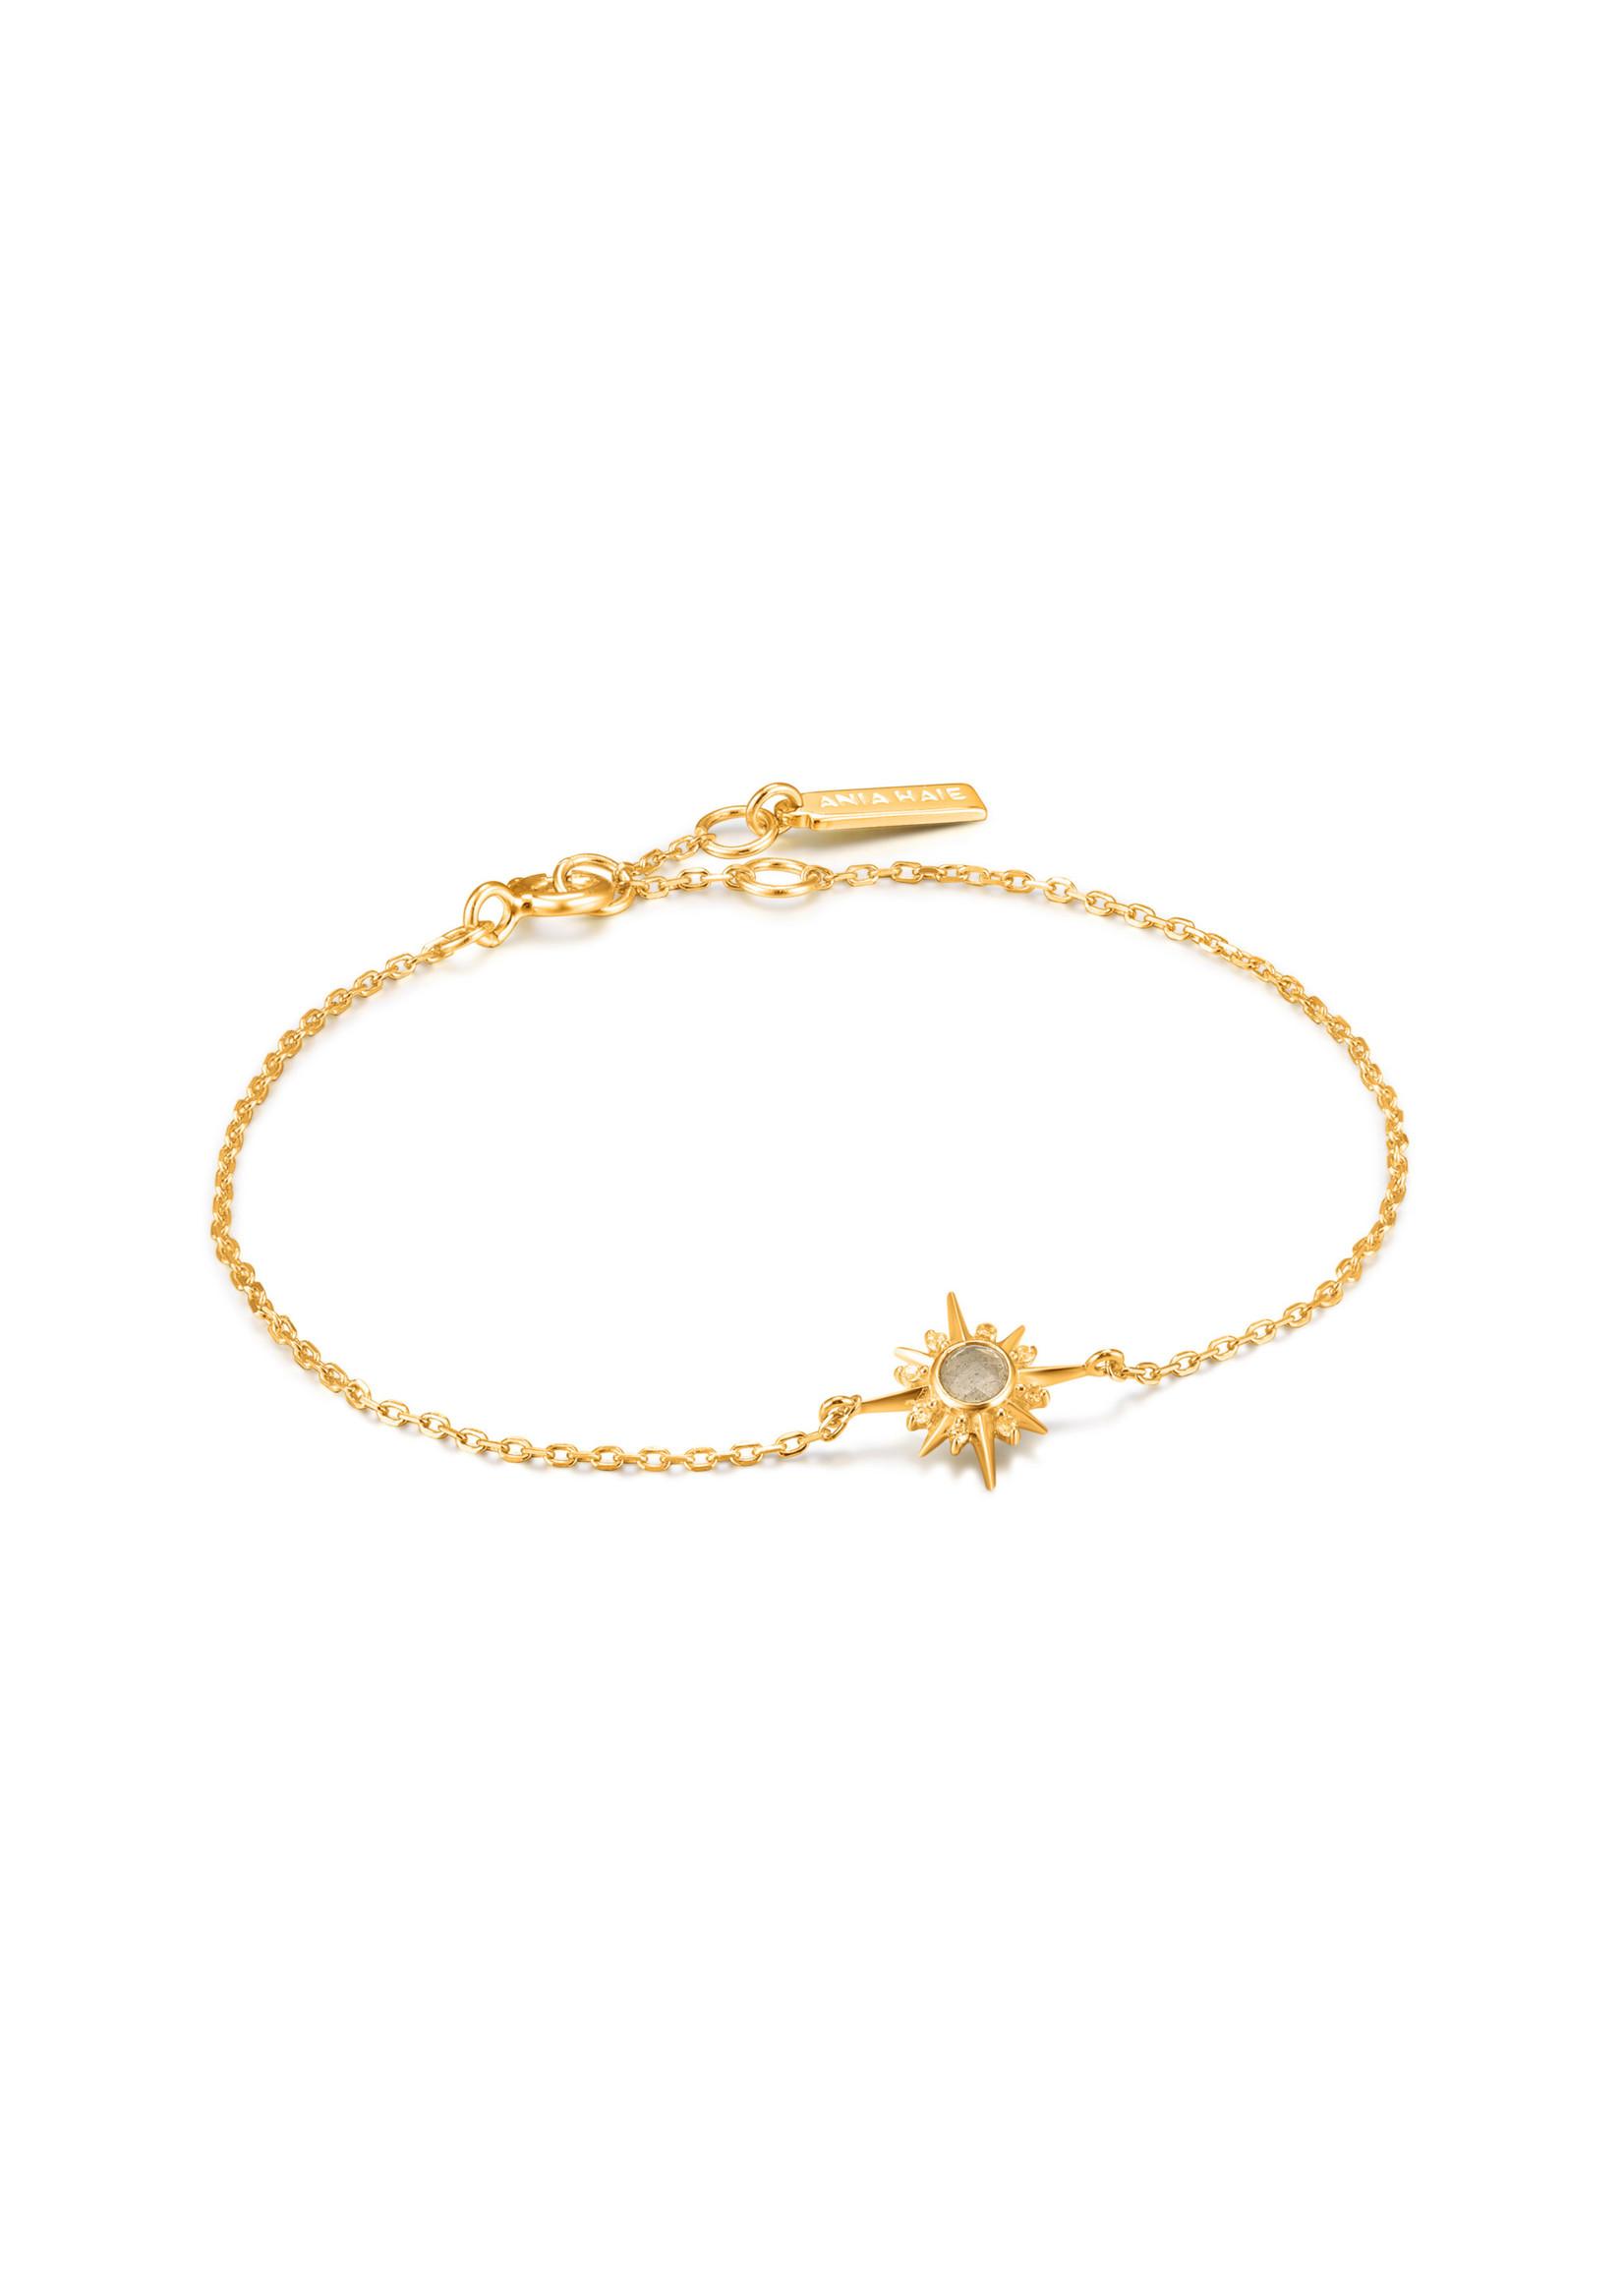 Ania Haie GOLD MIDNIGHT STAR BRACELET